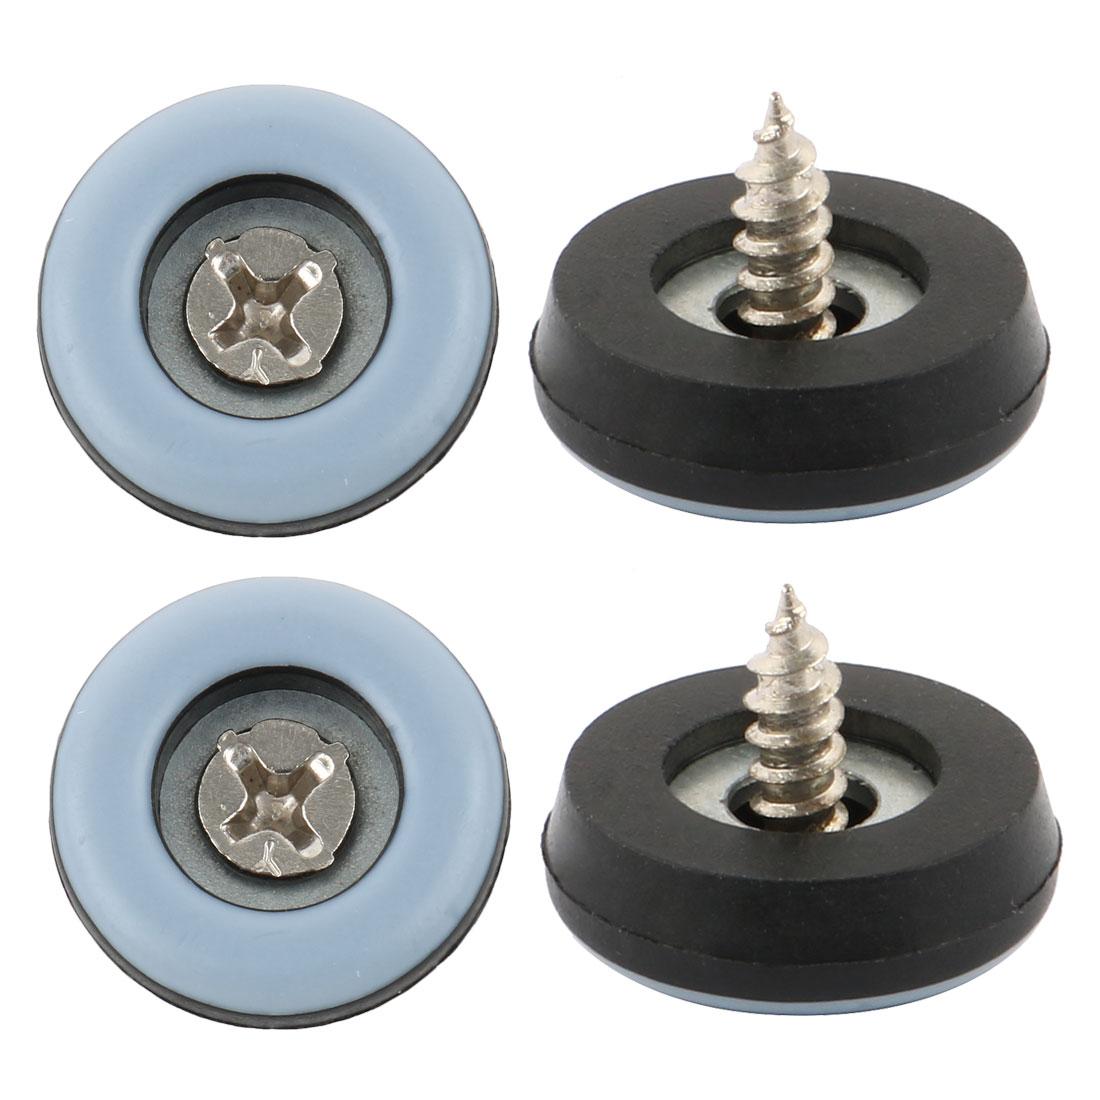 25mm Dia Stable Screw Furniture Mounting Slider for Hard Floor s 4 Pcs